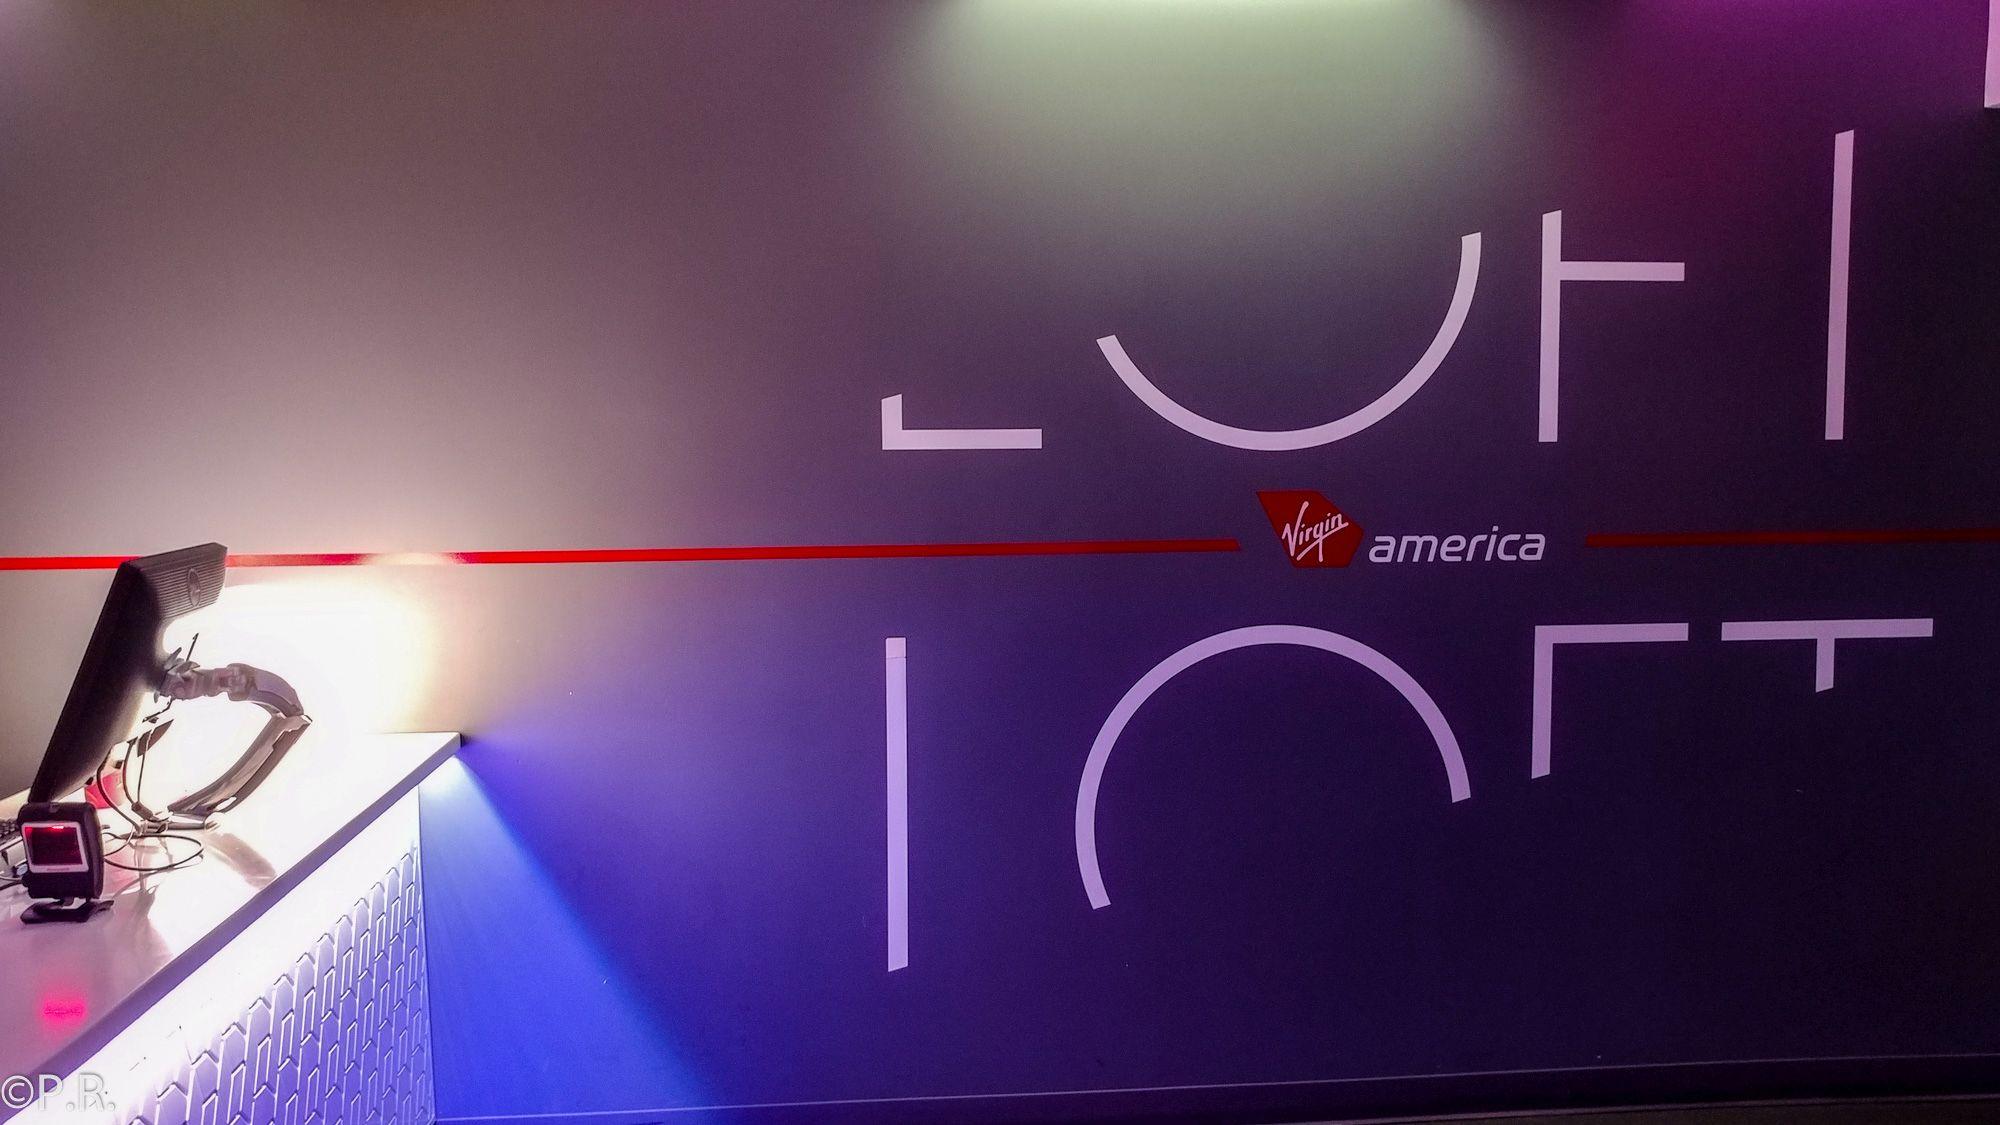 Lounge Review: Virgin America Loft LAX (CLOSED)